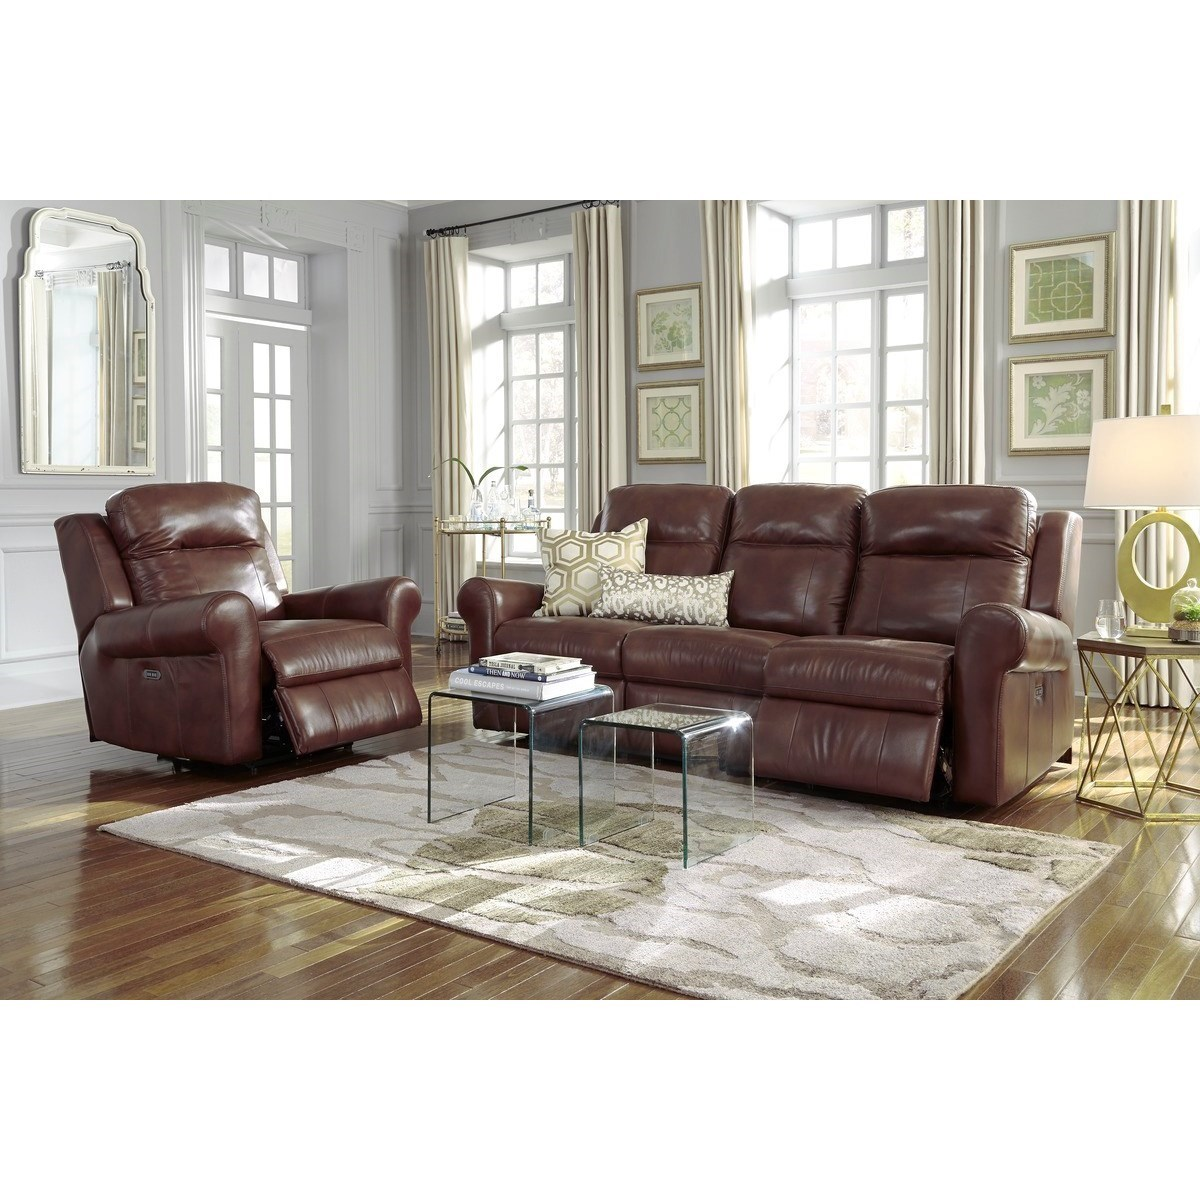 Living Room Furniture Northern Va: Palliser Vega Power Reclining Living Room Group